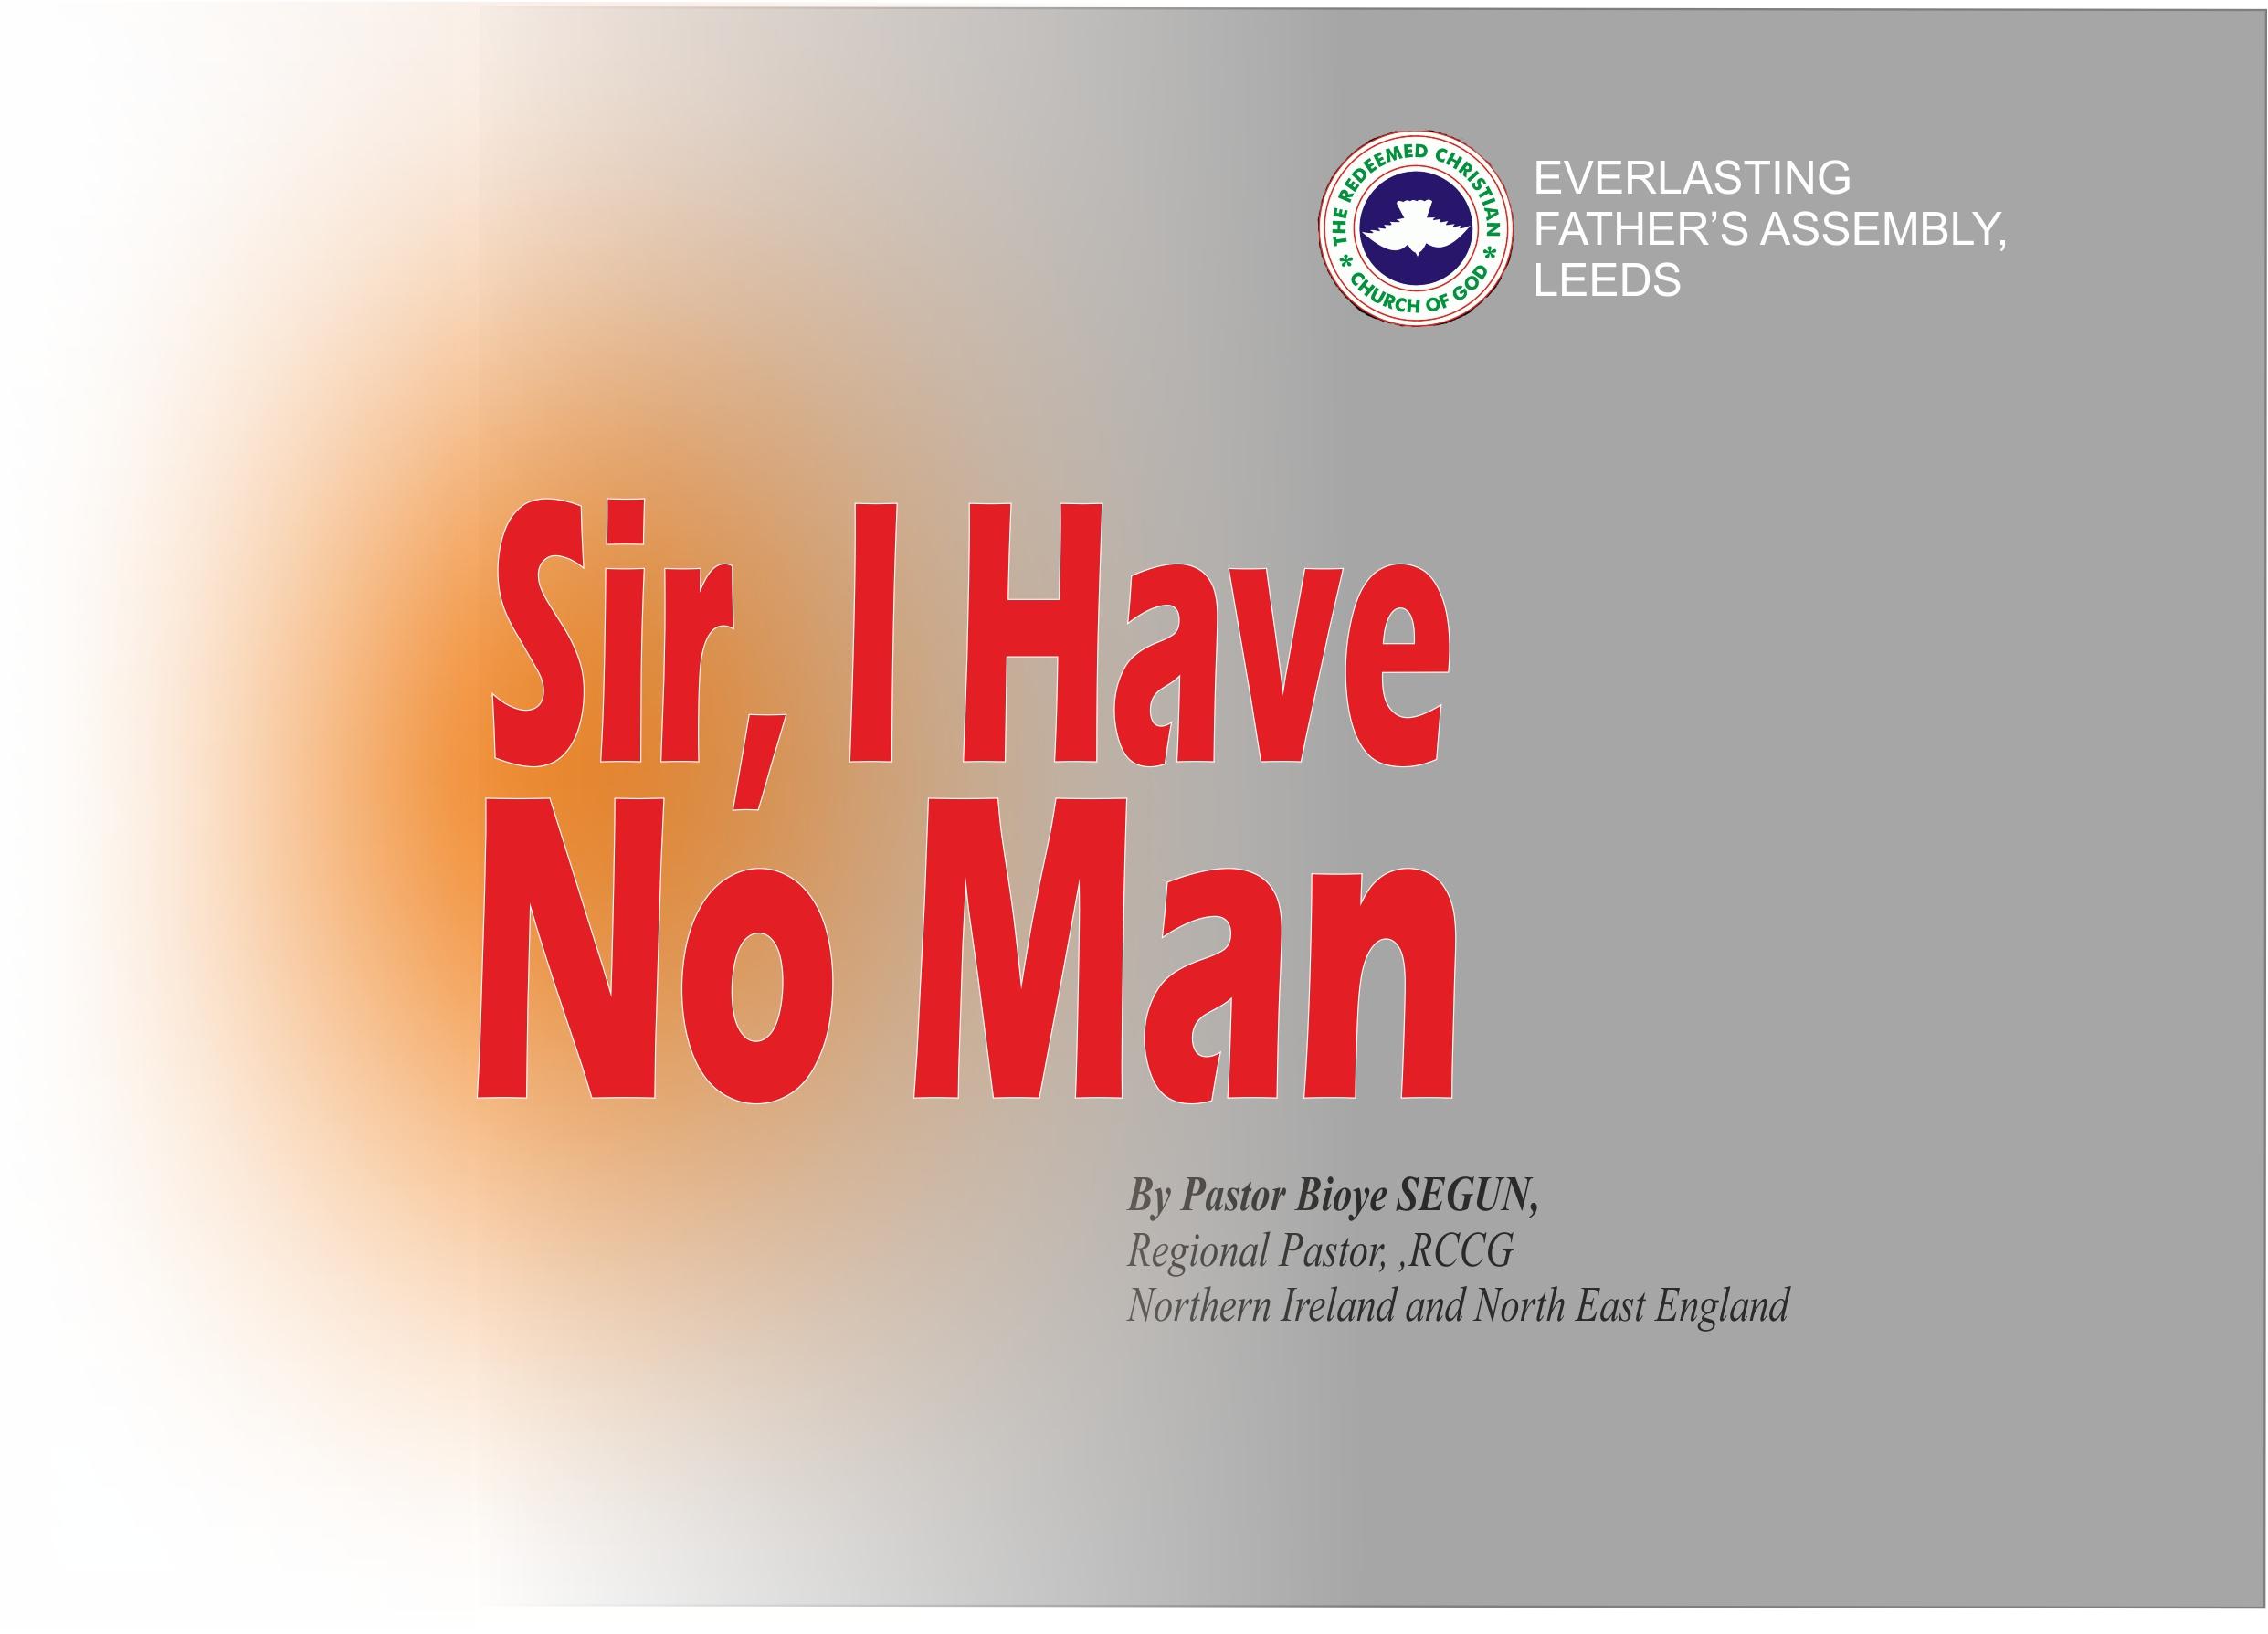 Sir, I Have No Man, by Pastor Bioye Segun